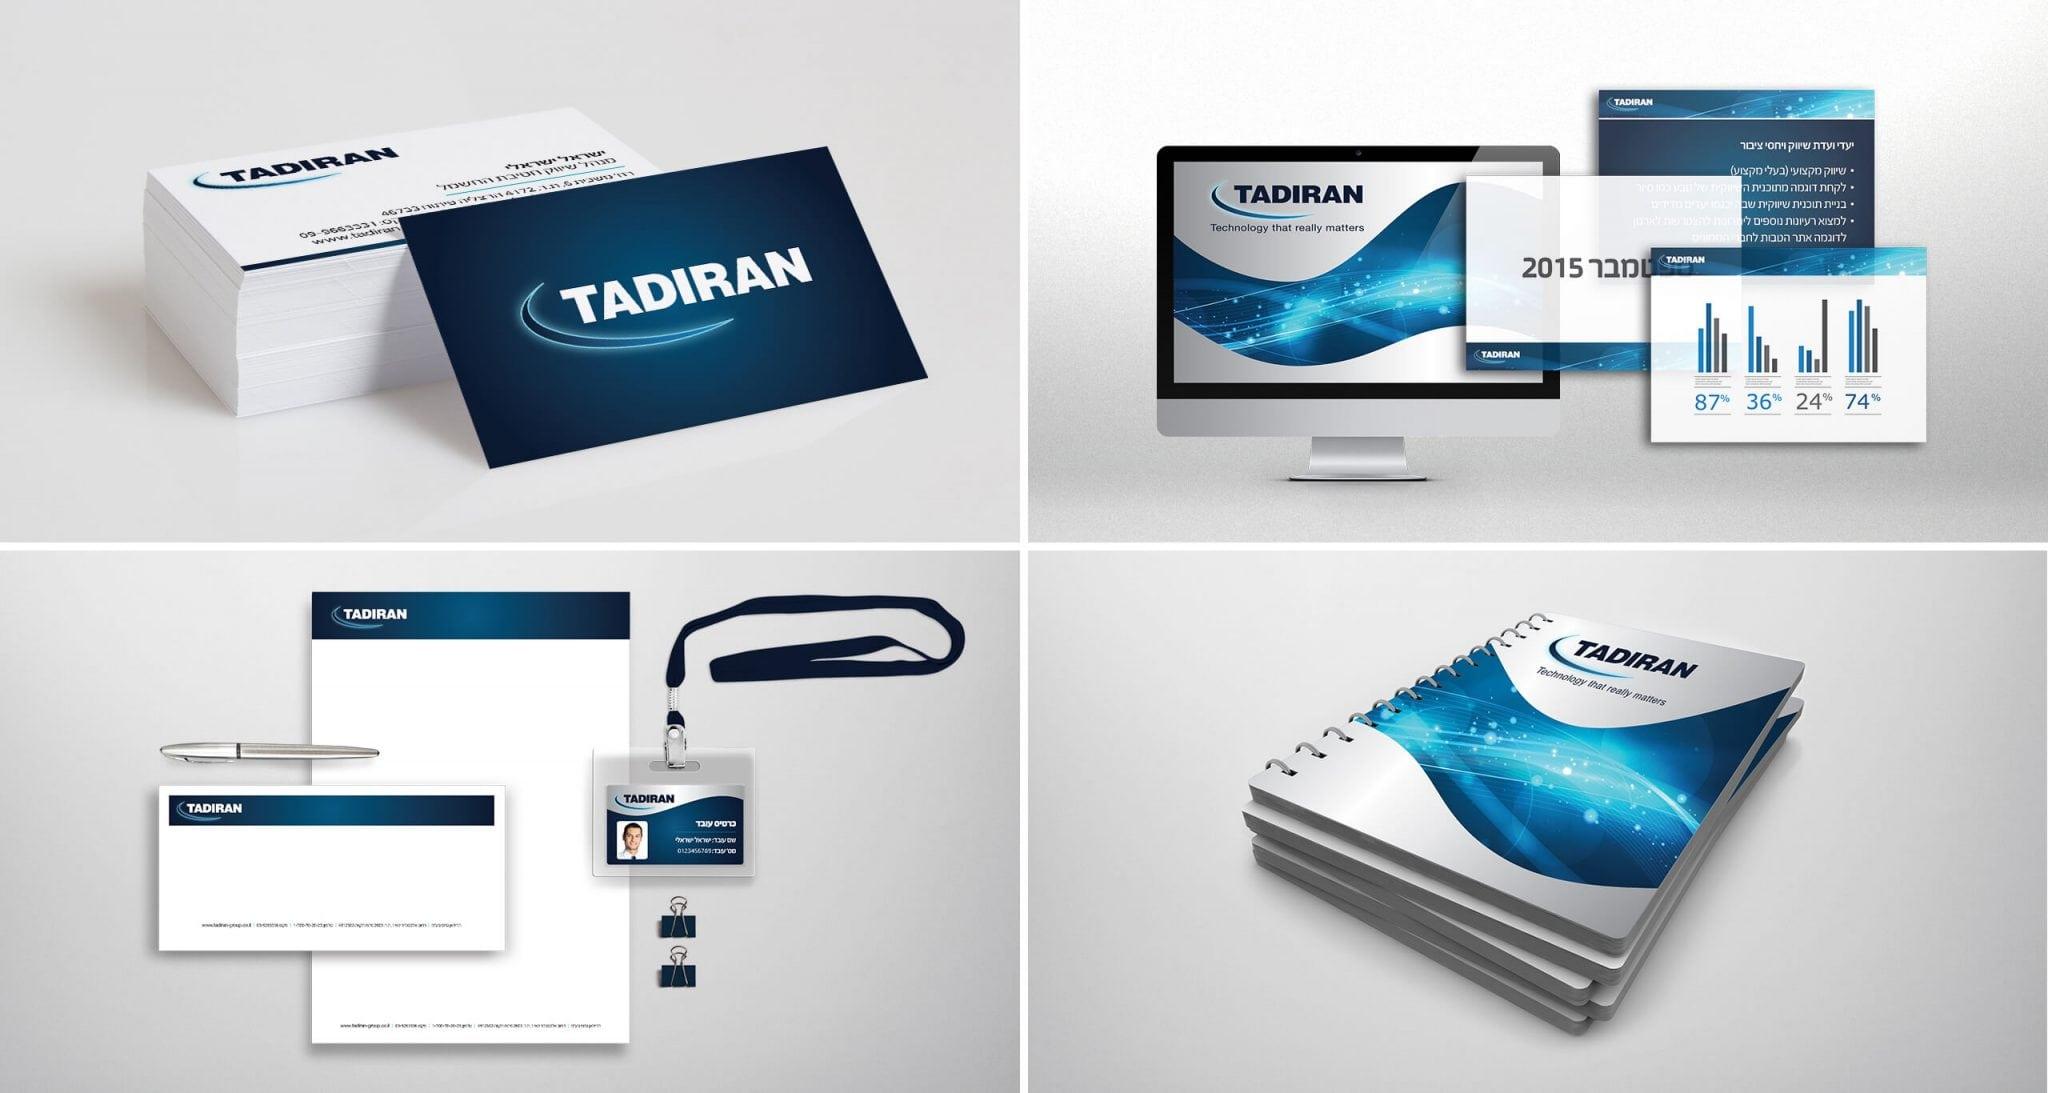 TADIRAN_page03_2560x1366